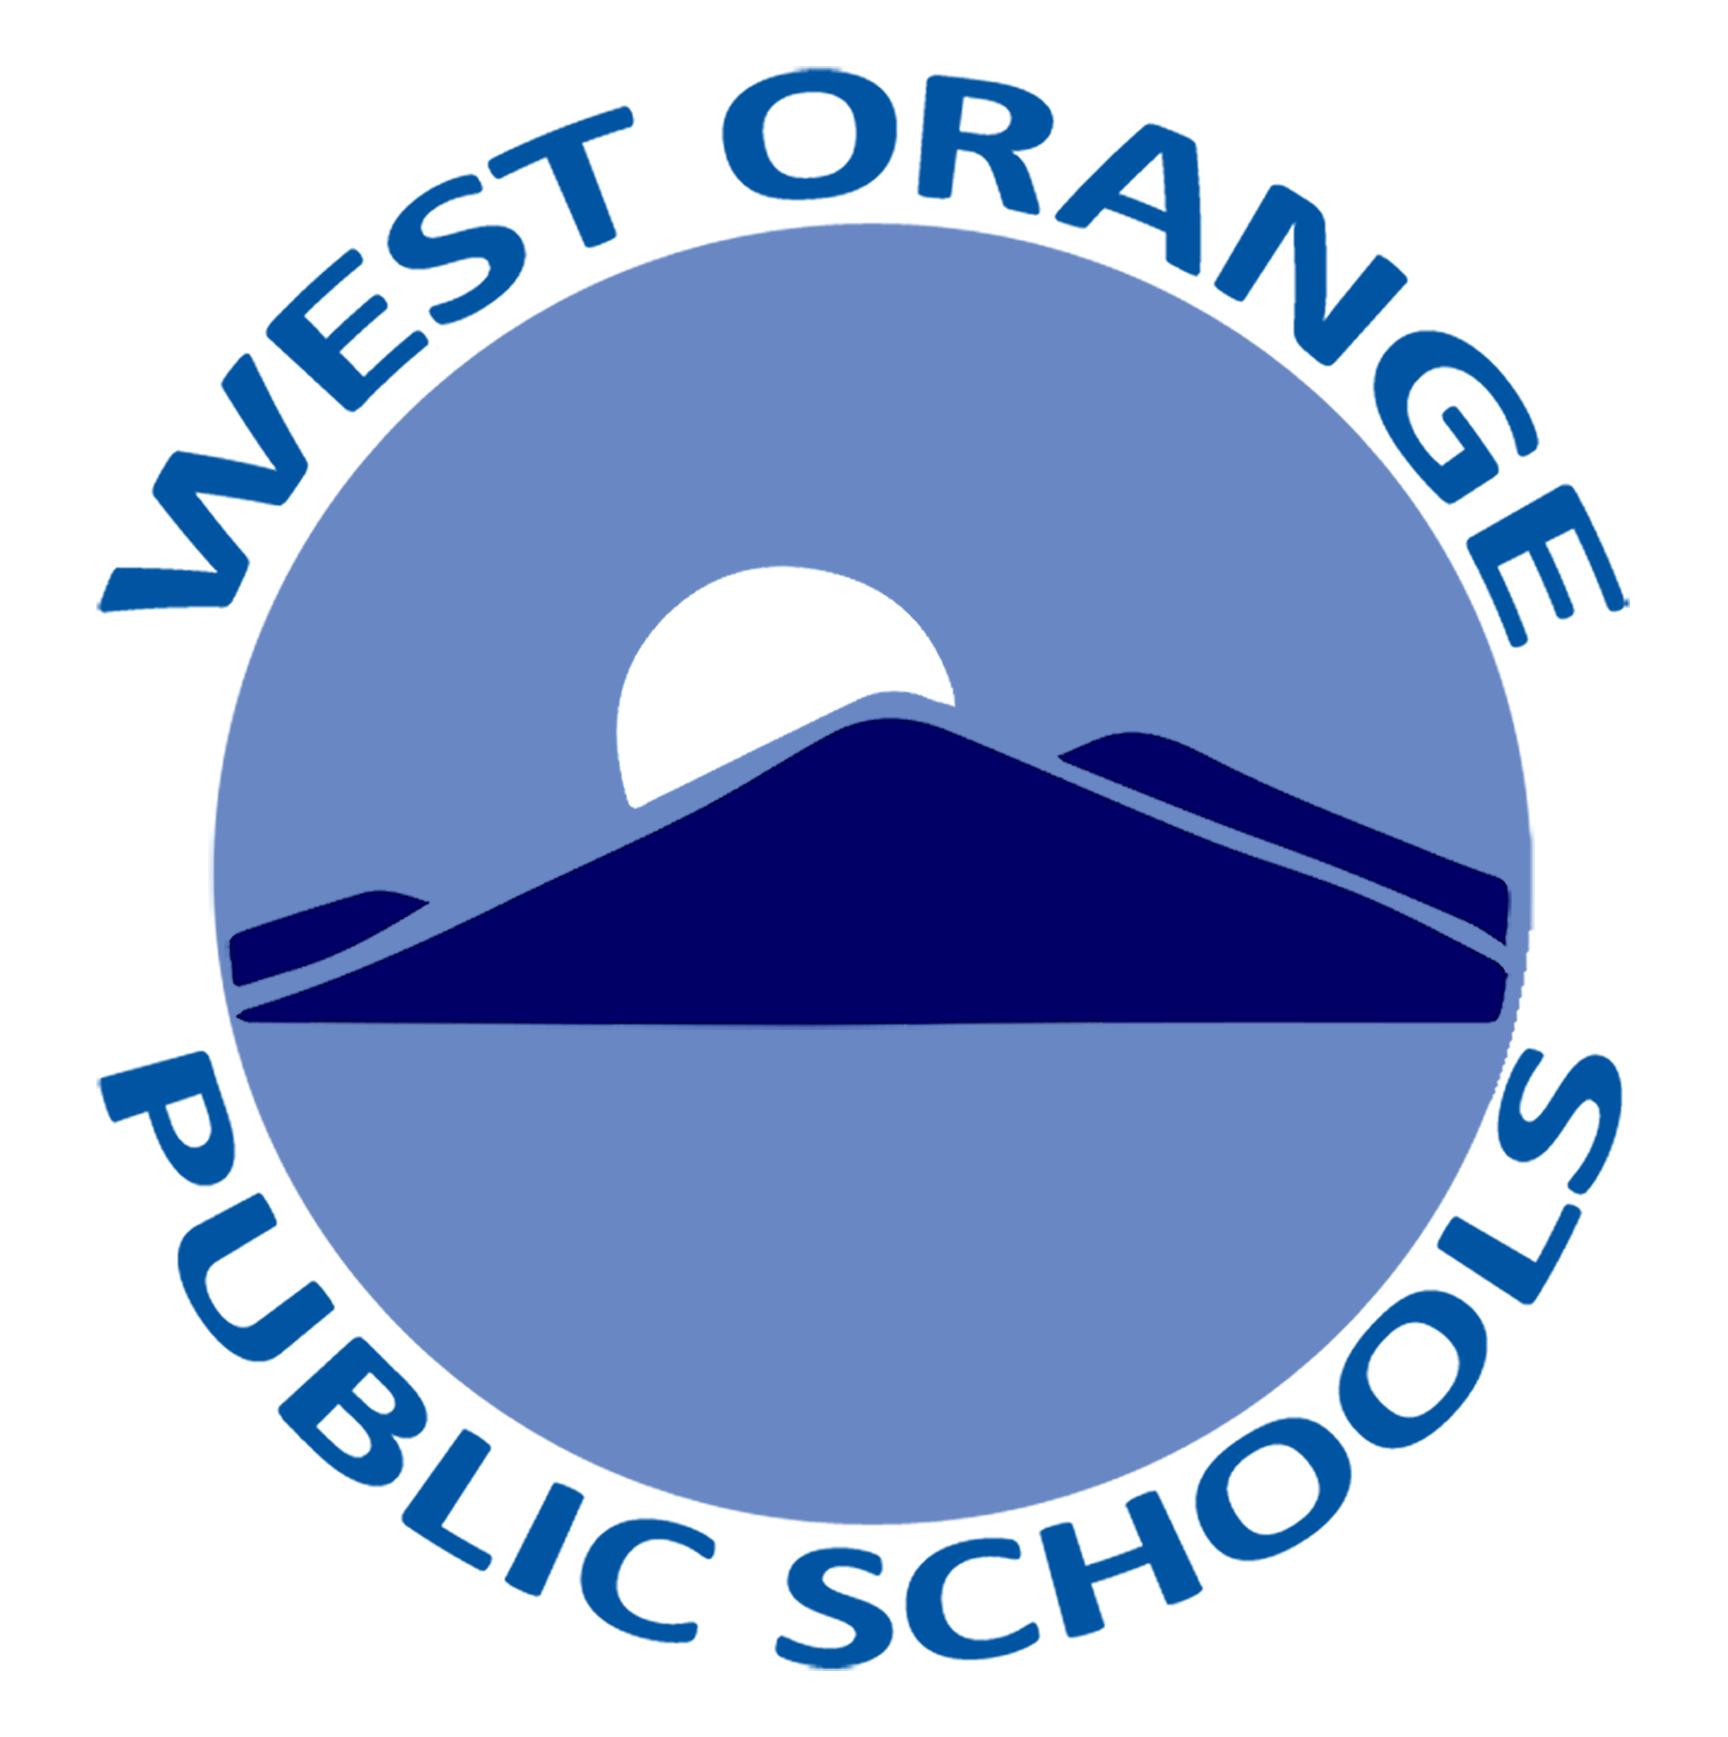 WO Schools